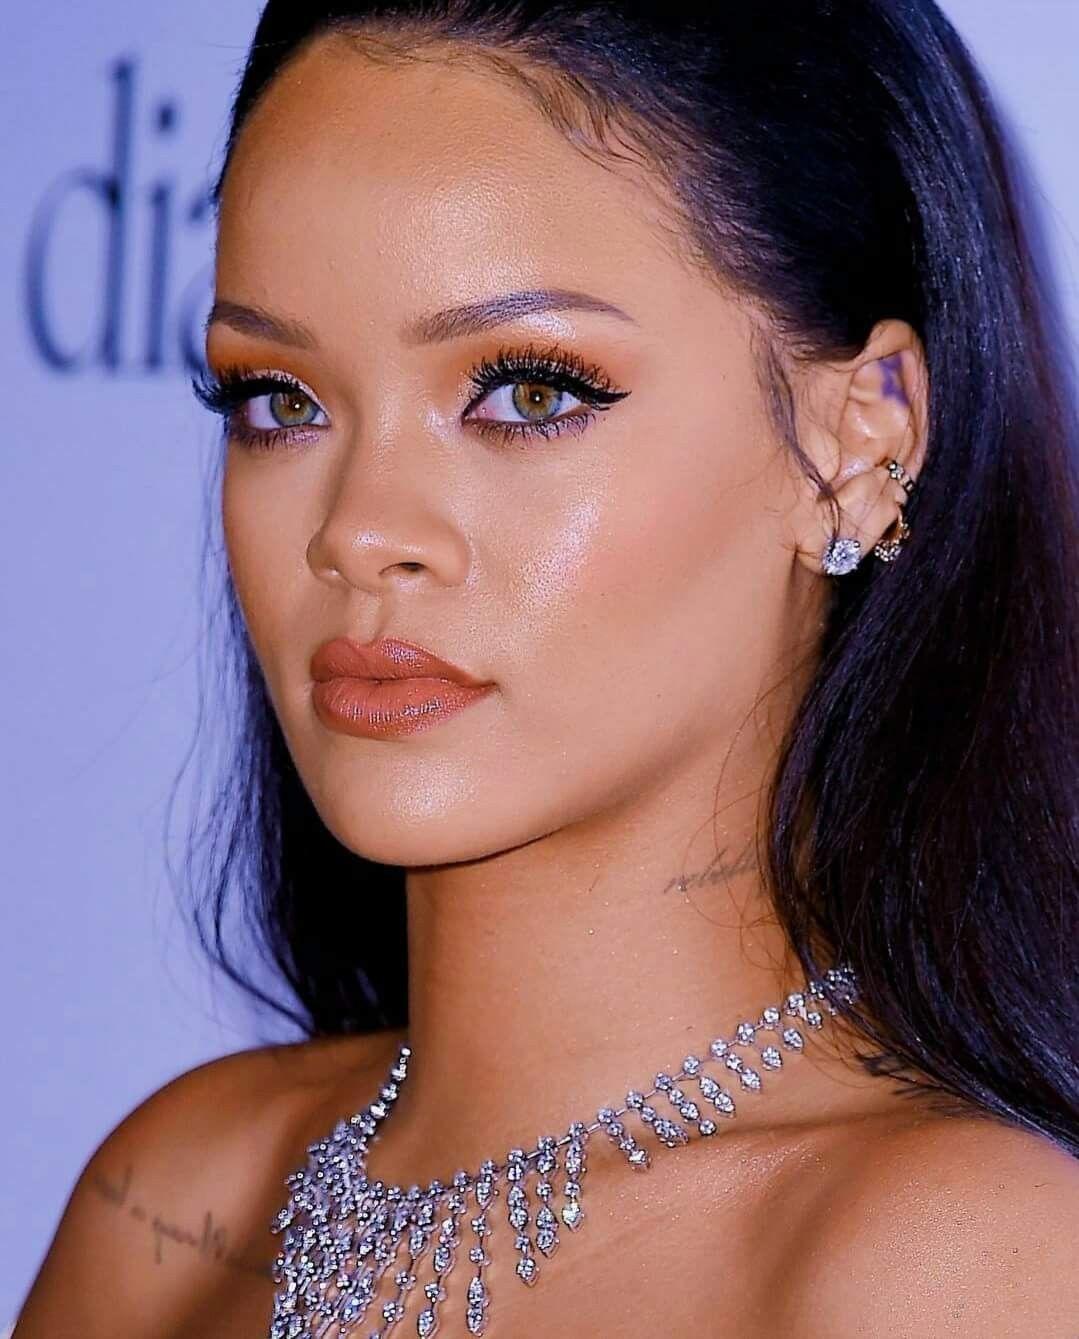 Rihanna Rihanna Makeup Rihanna Face Rihanna Looks